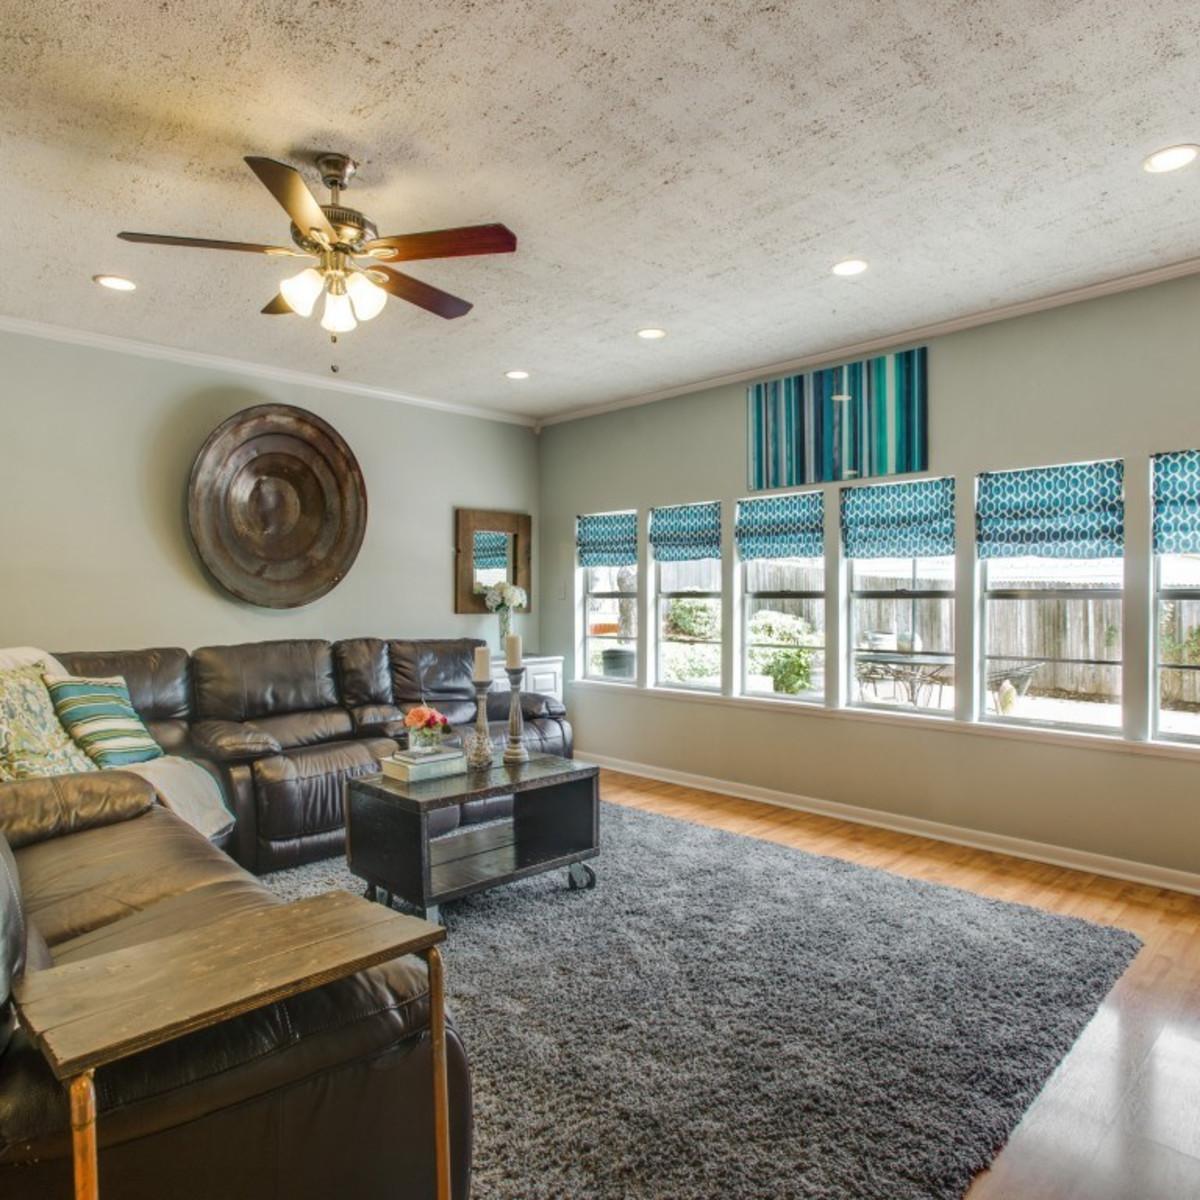 2421 Springhill Dr. living room